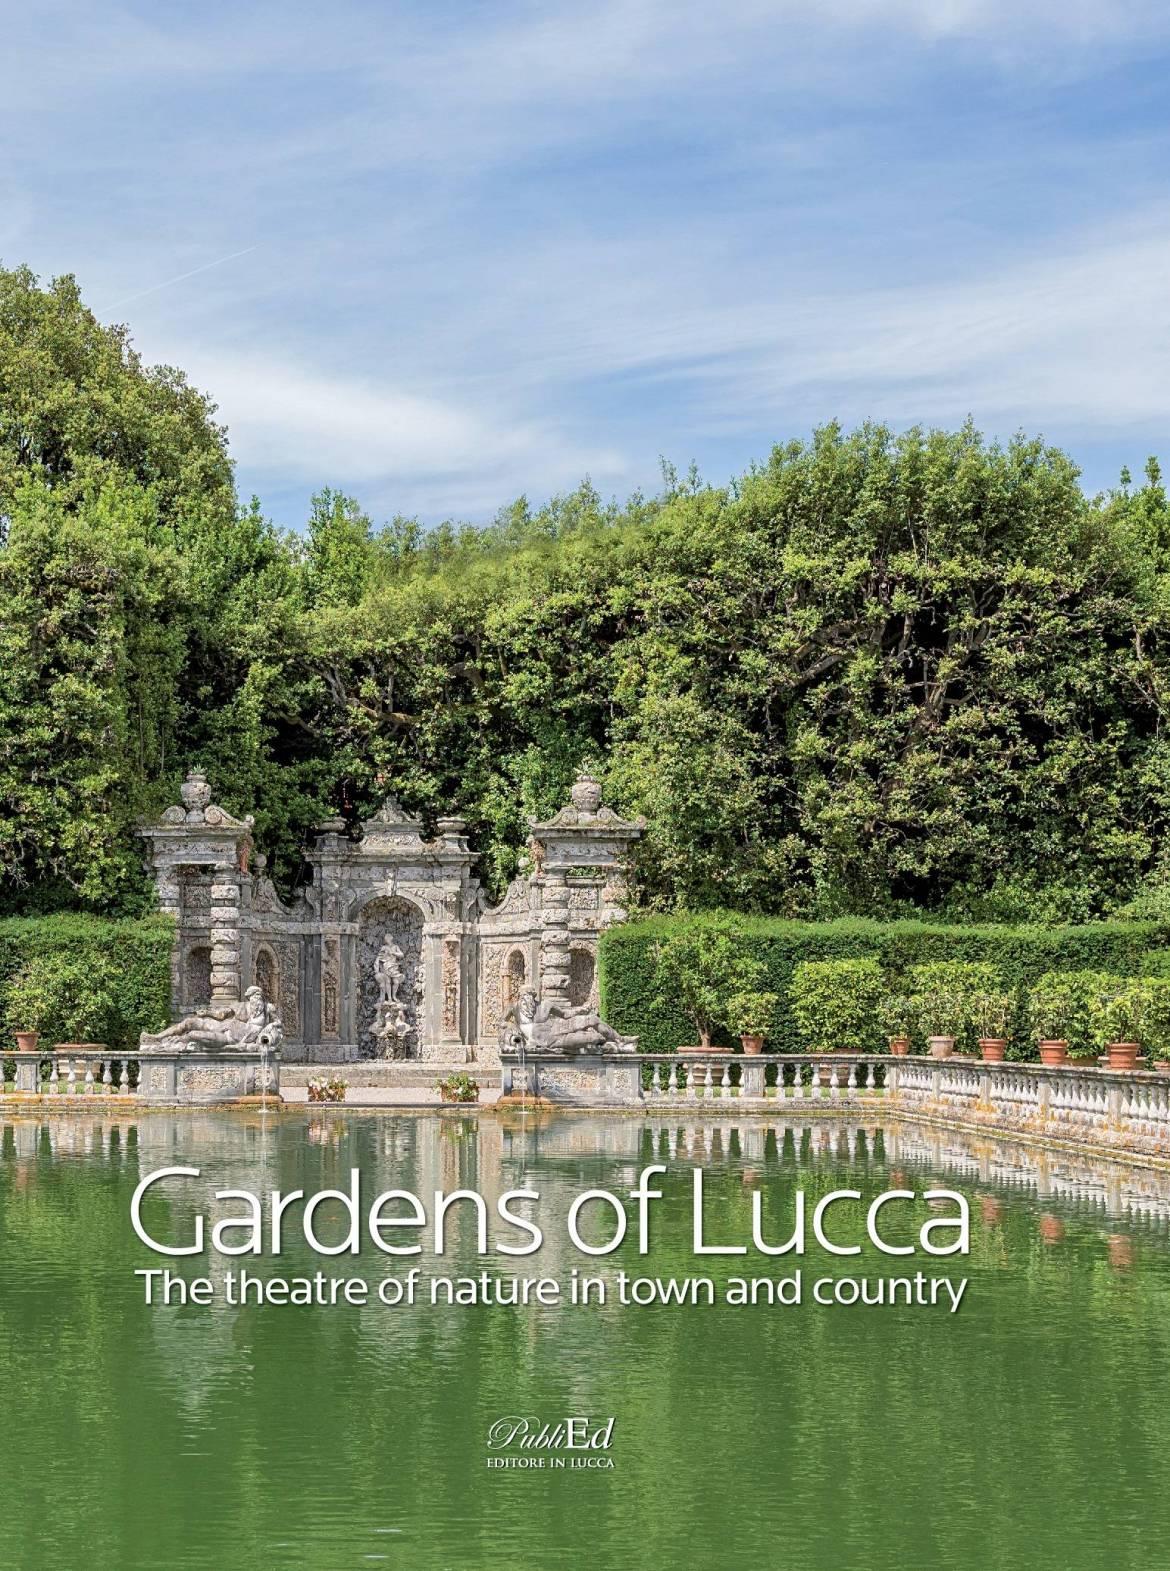 Gardens-of-Lucca-e1561625078820.jpg